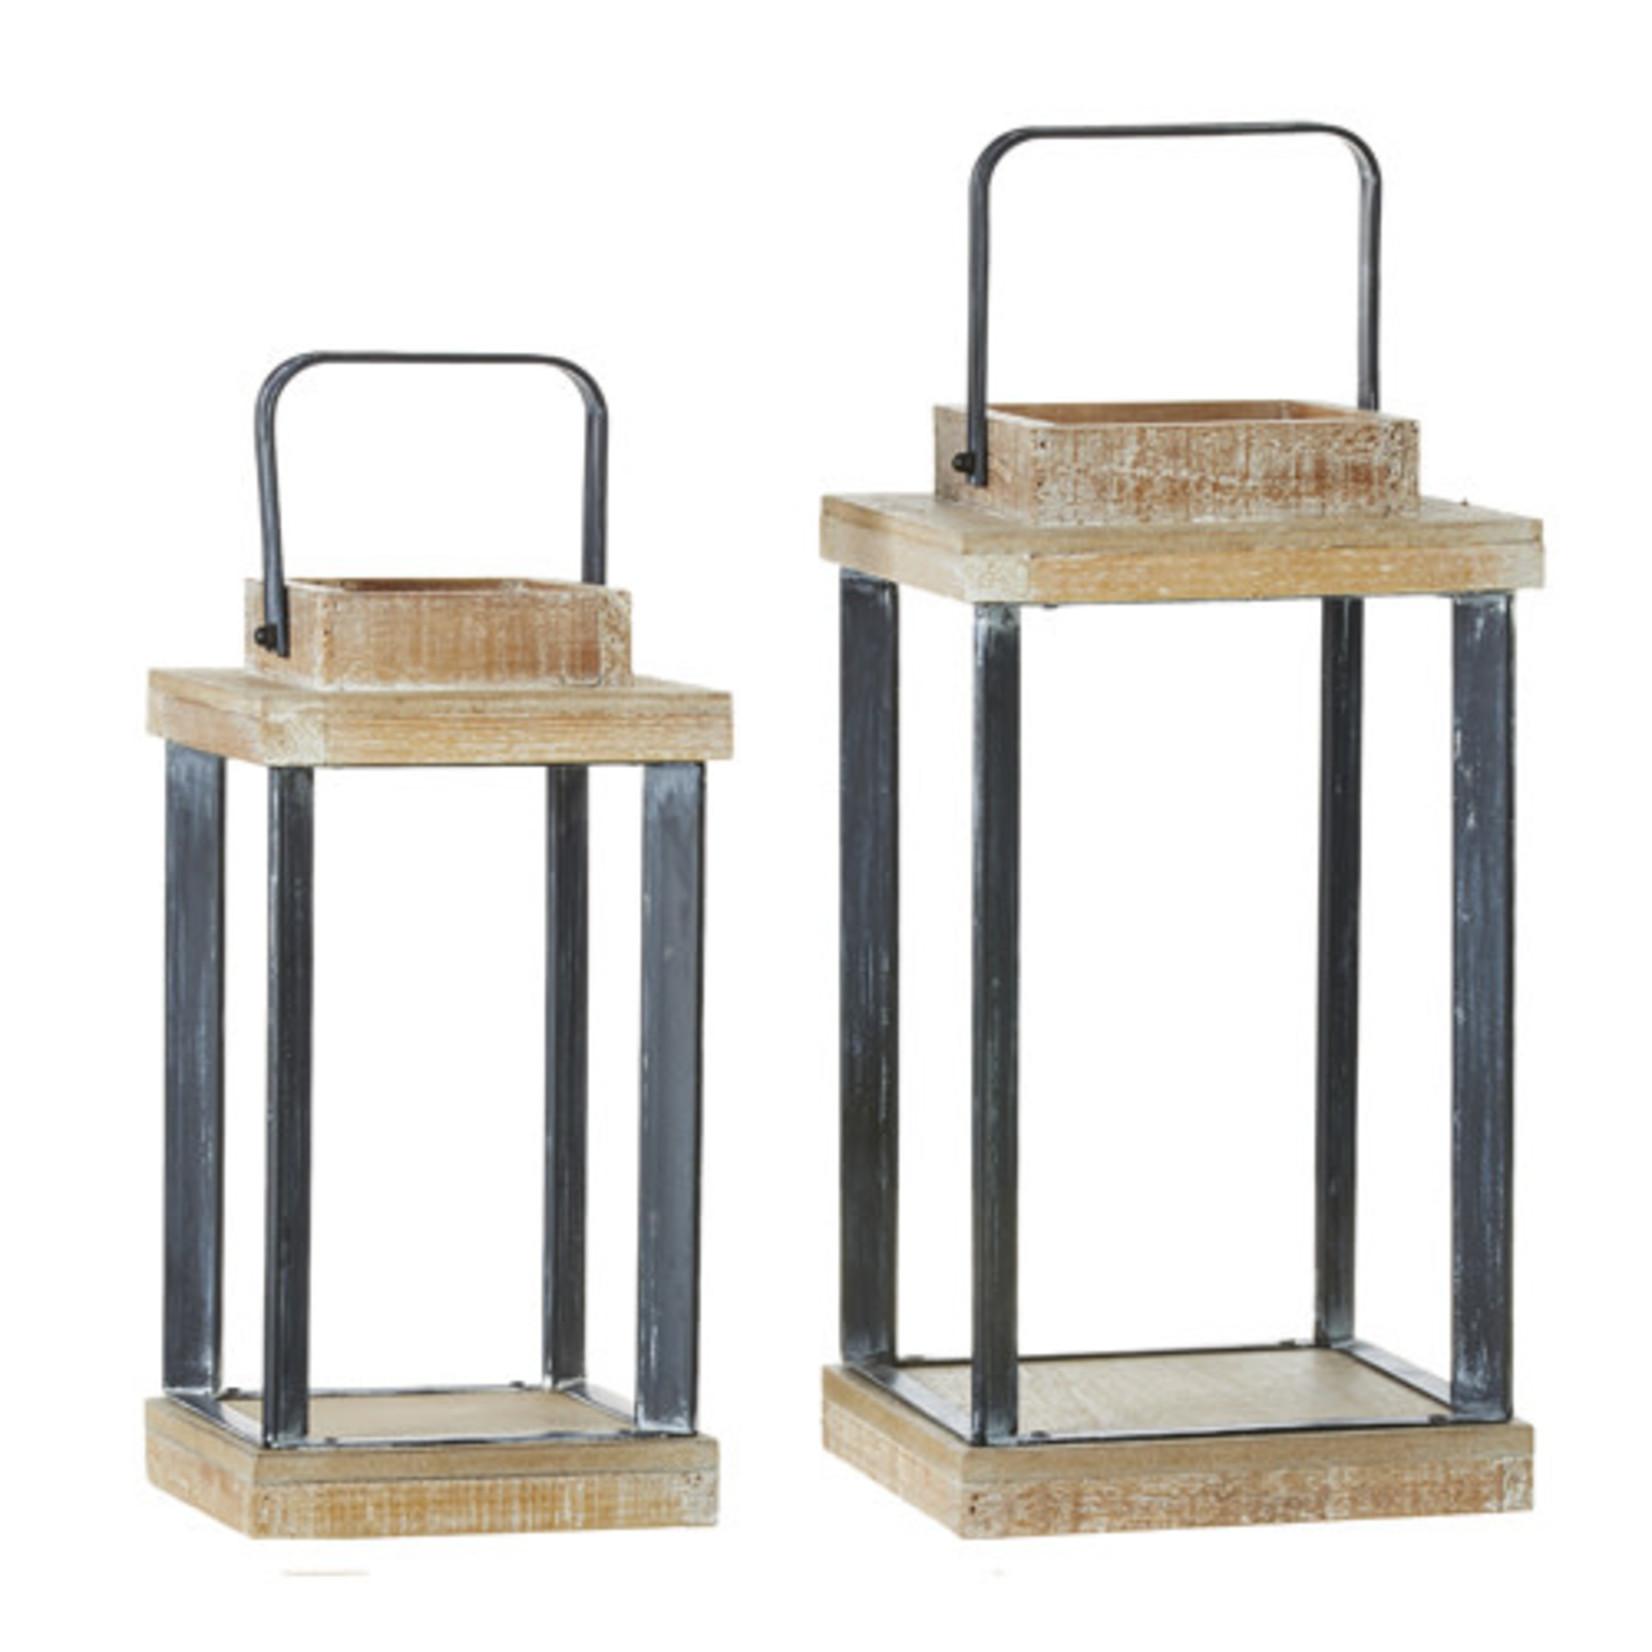 Bungalow Lantern (Multiple Sizes)